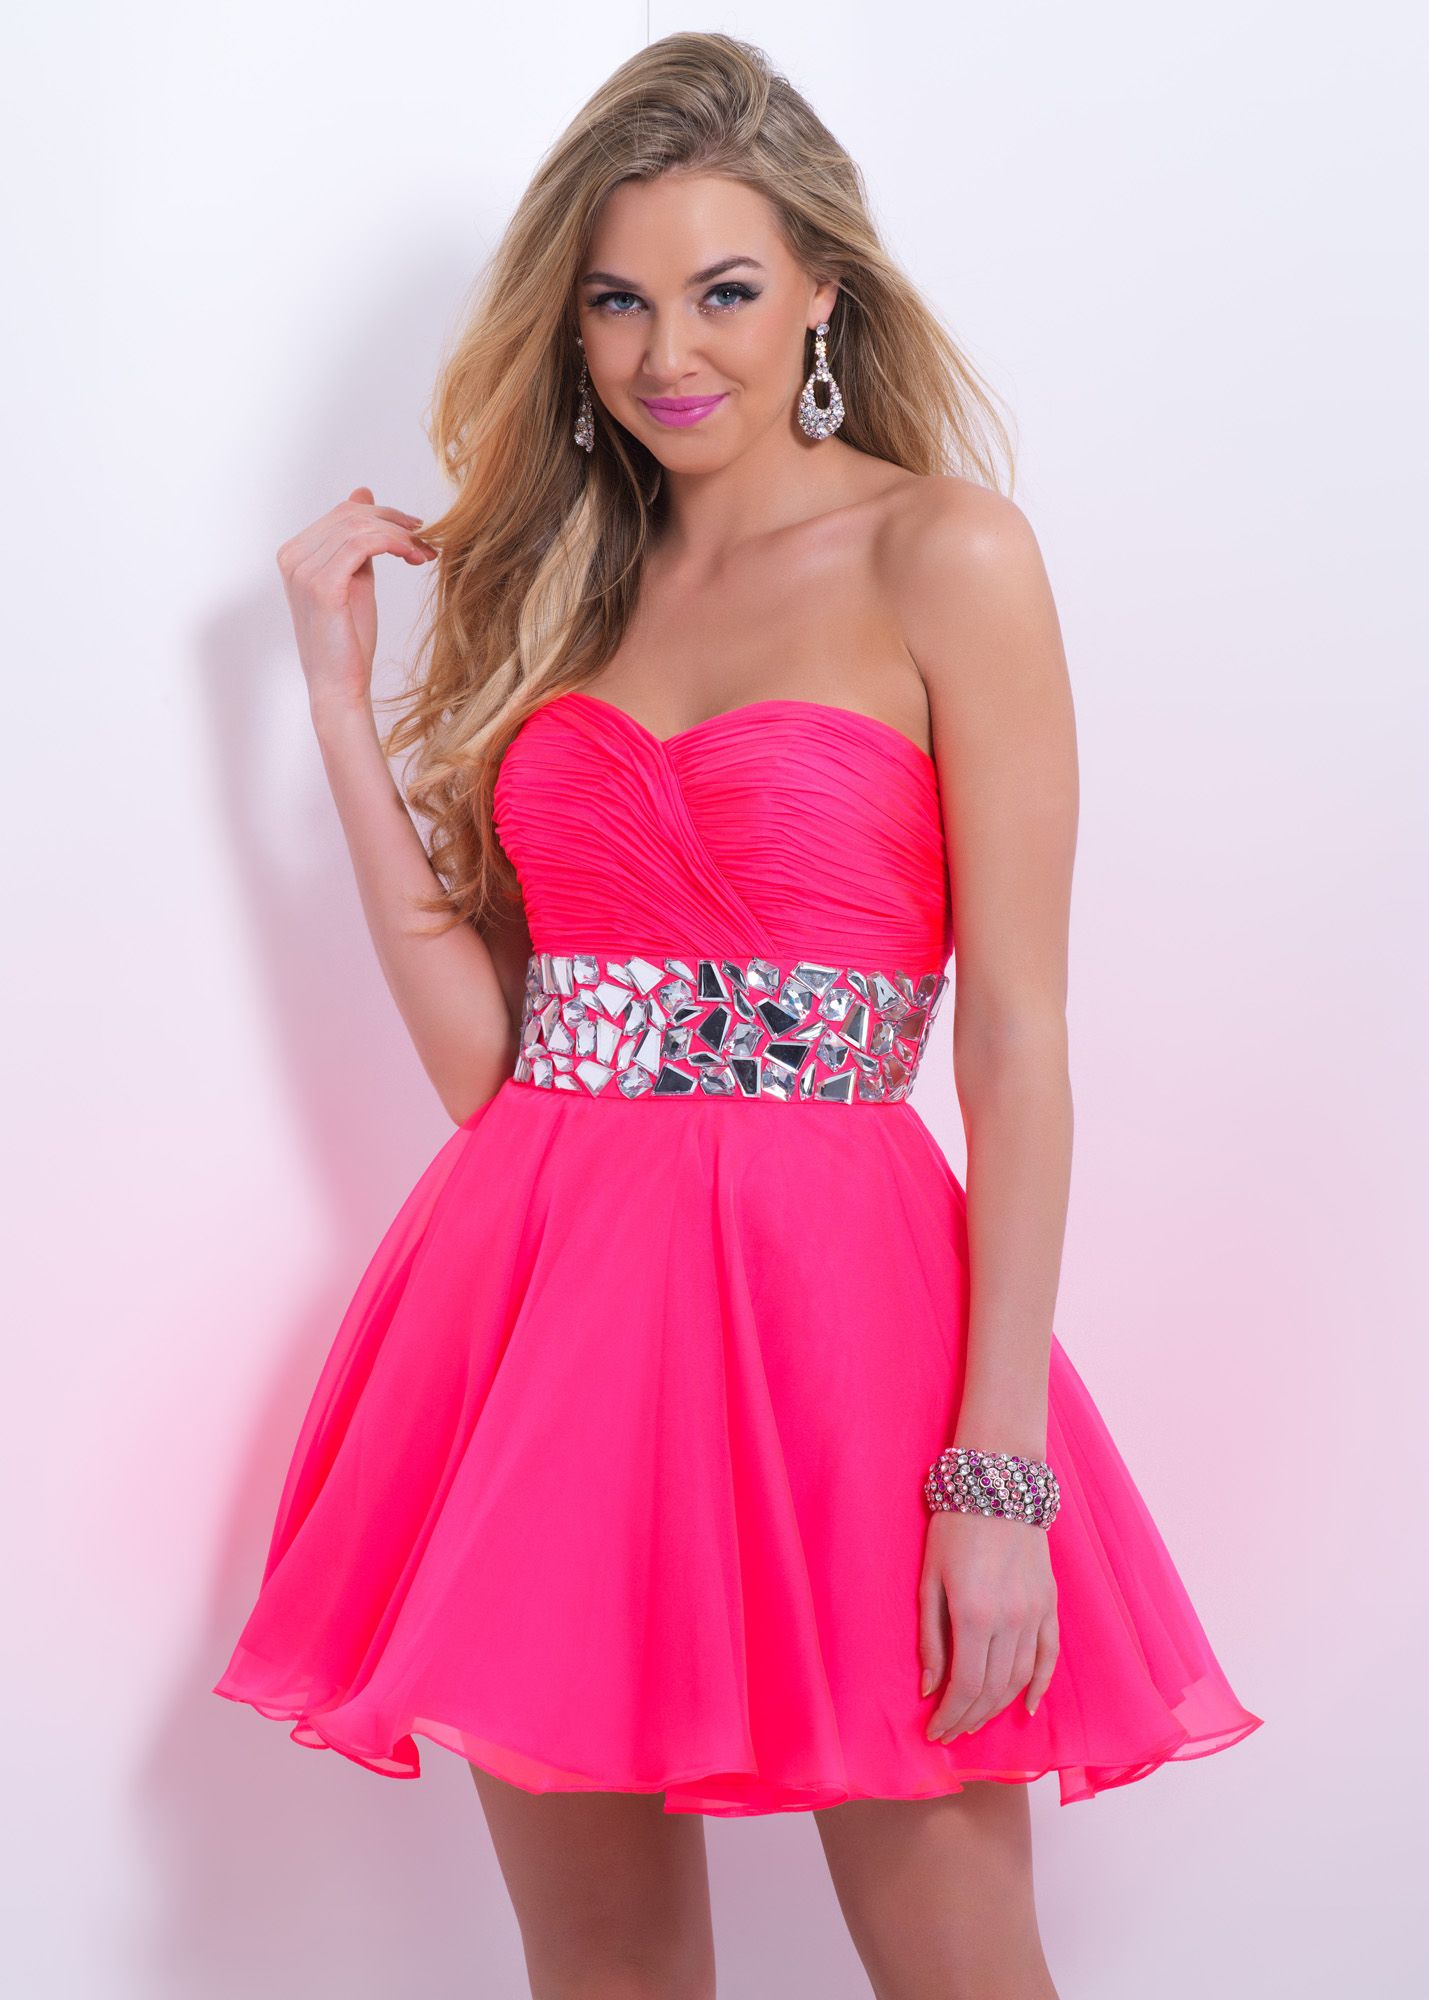 f4d5c85c9f Blush 9683 - Barbie Pink Strapless Sweetheart Dress - RissyRoos.com ...